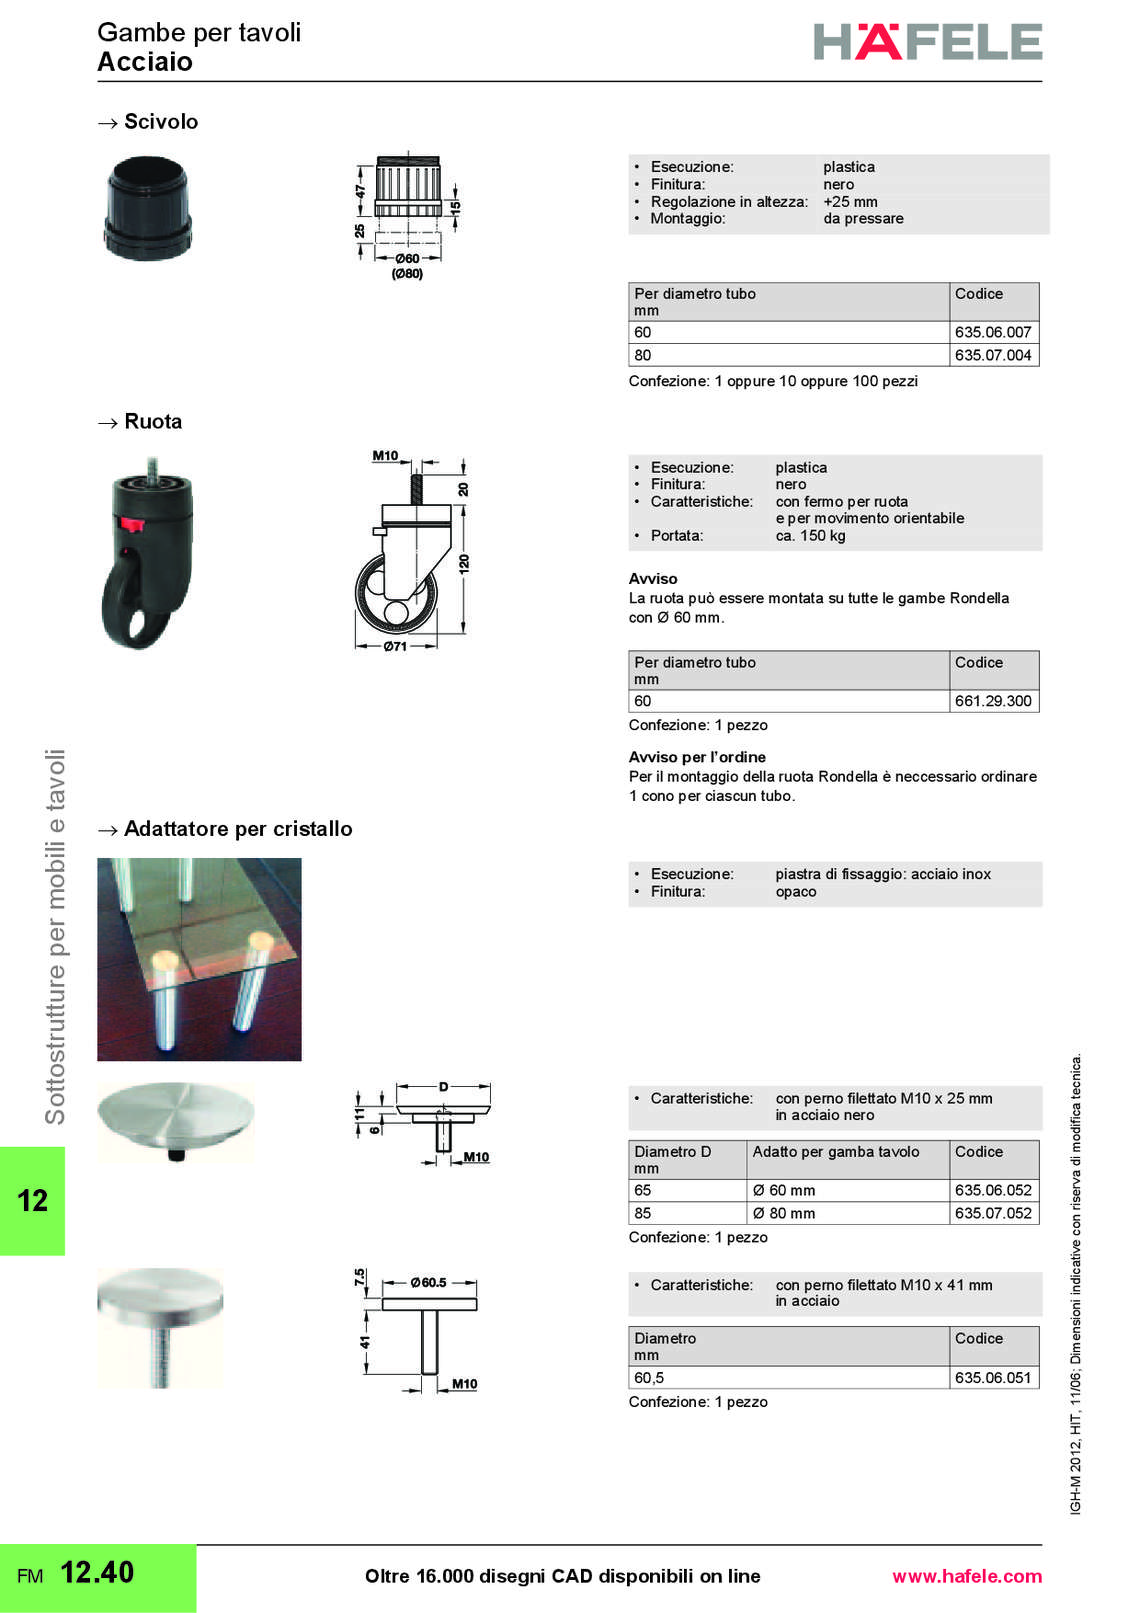 hafele-sottostrutture-per-mobili_83_063.jpg